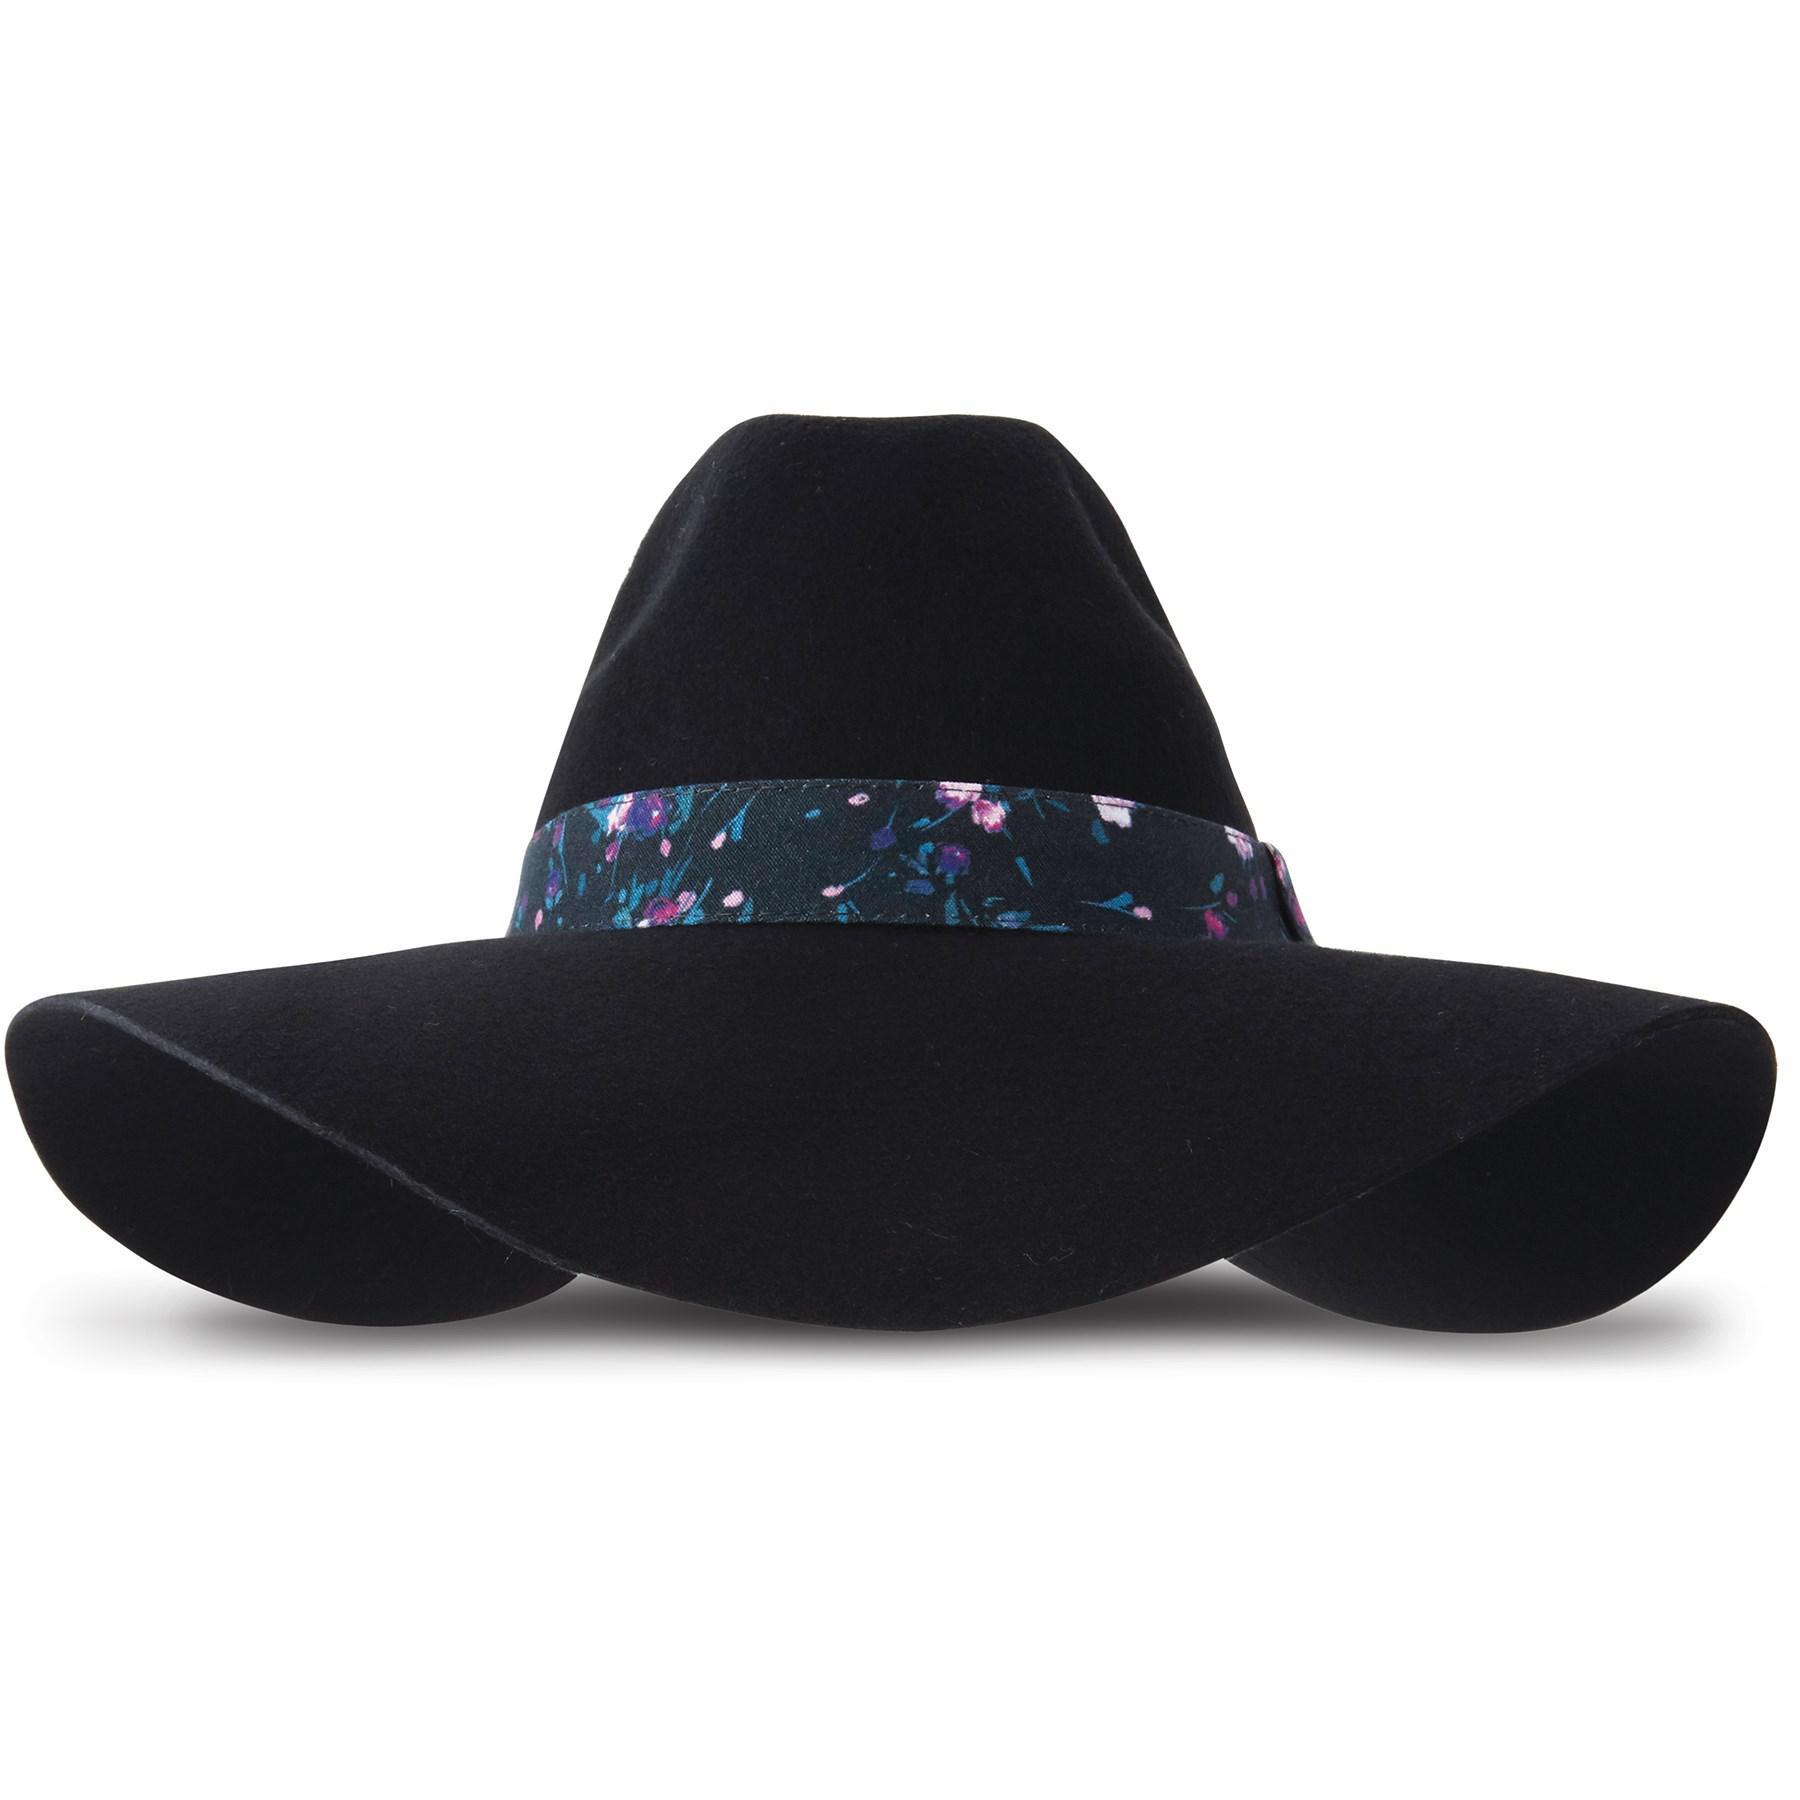 Lyst - Keds Felt Floppy Hat in Black c7245fd65f6c